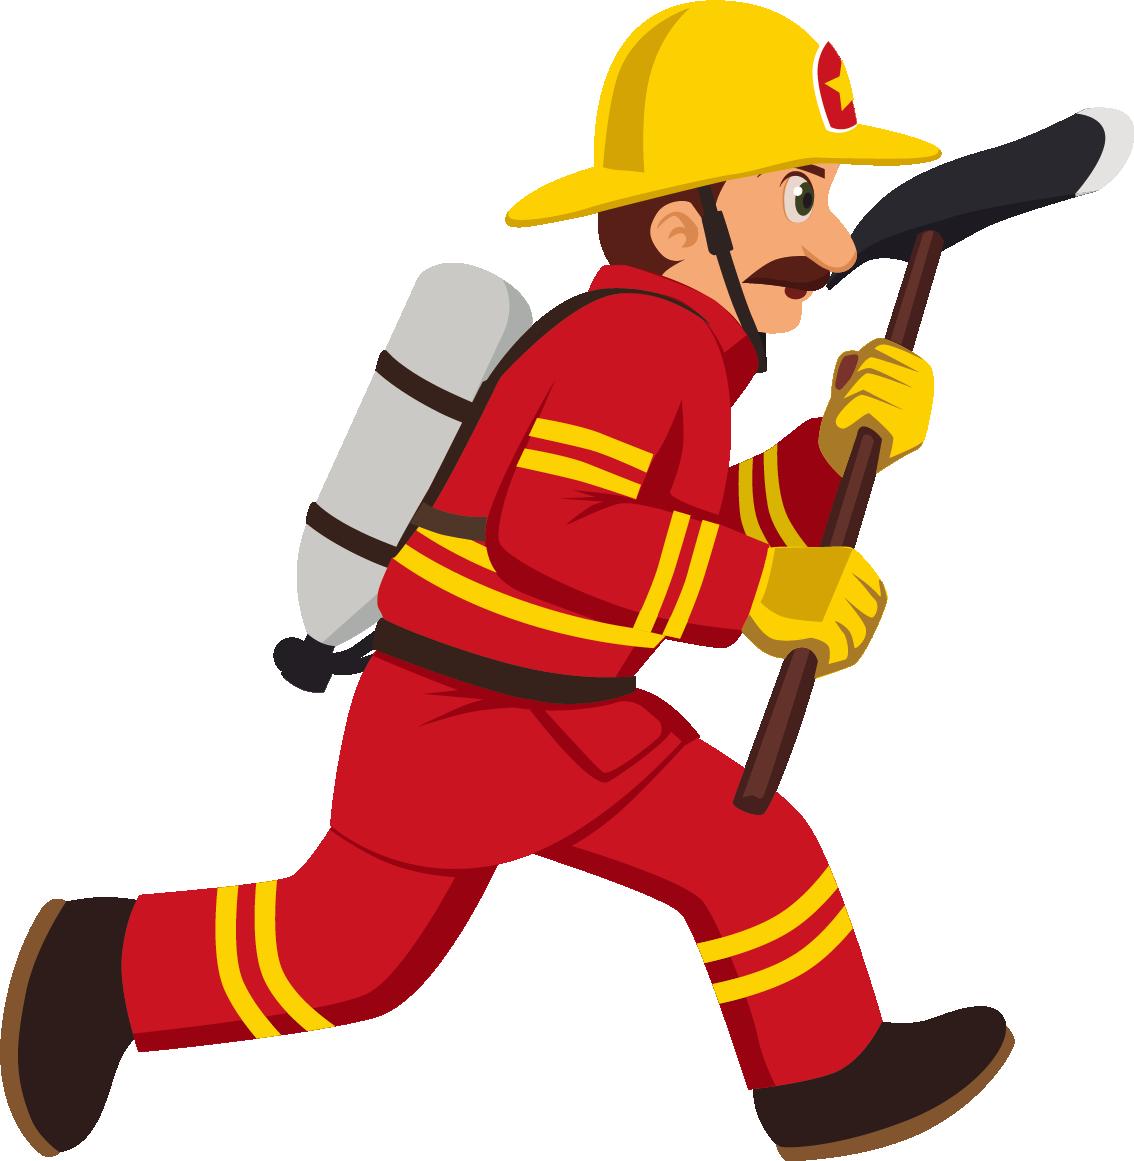 Firefighter clipart uniform. Cartoon royalty free illustration